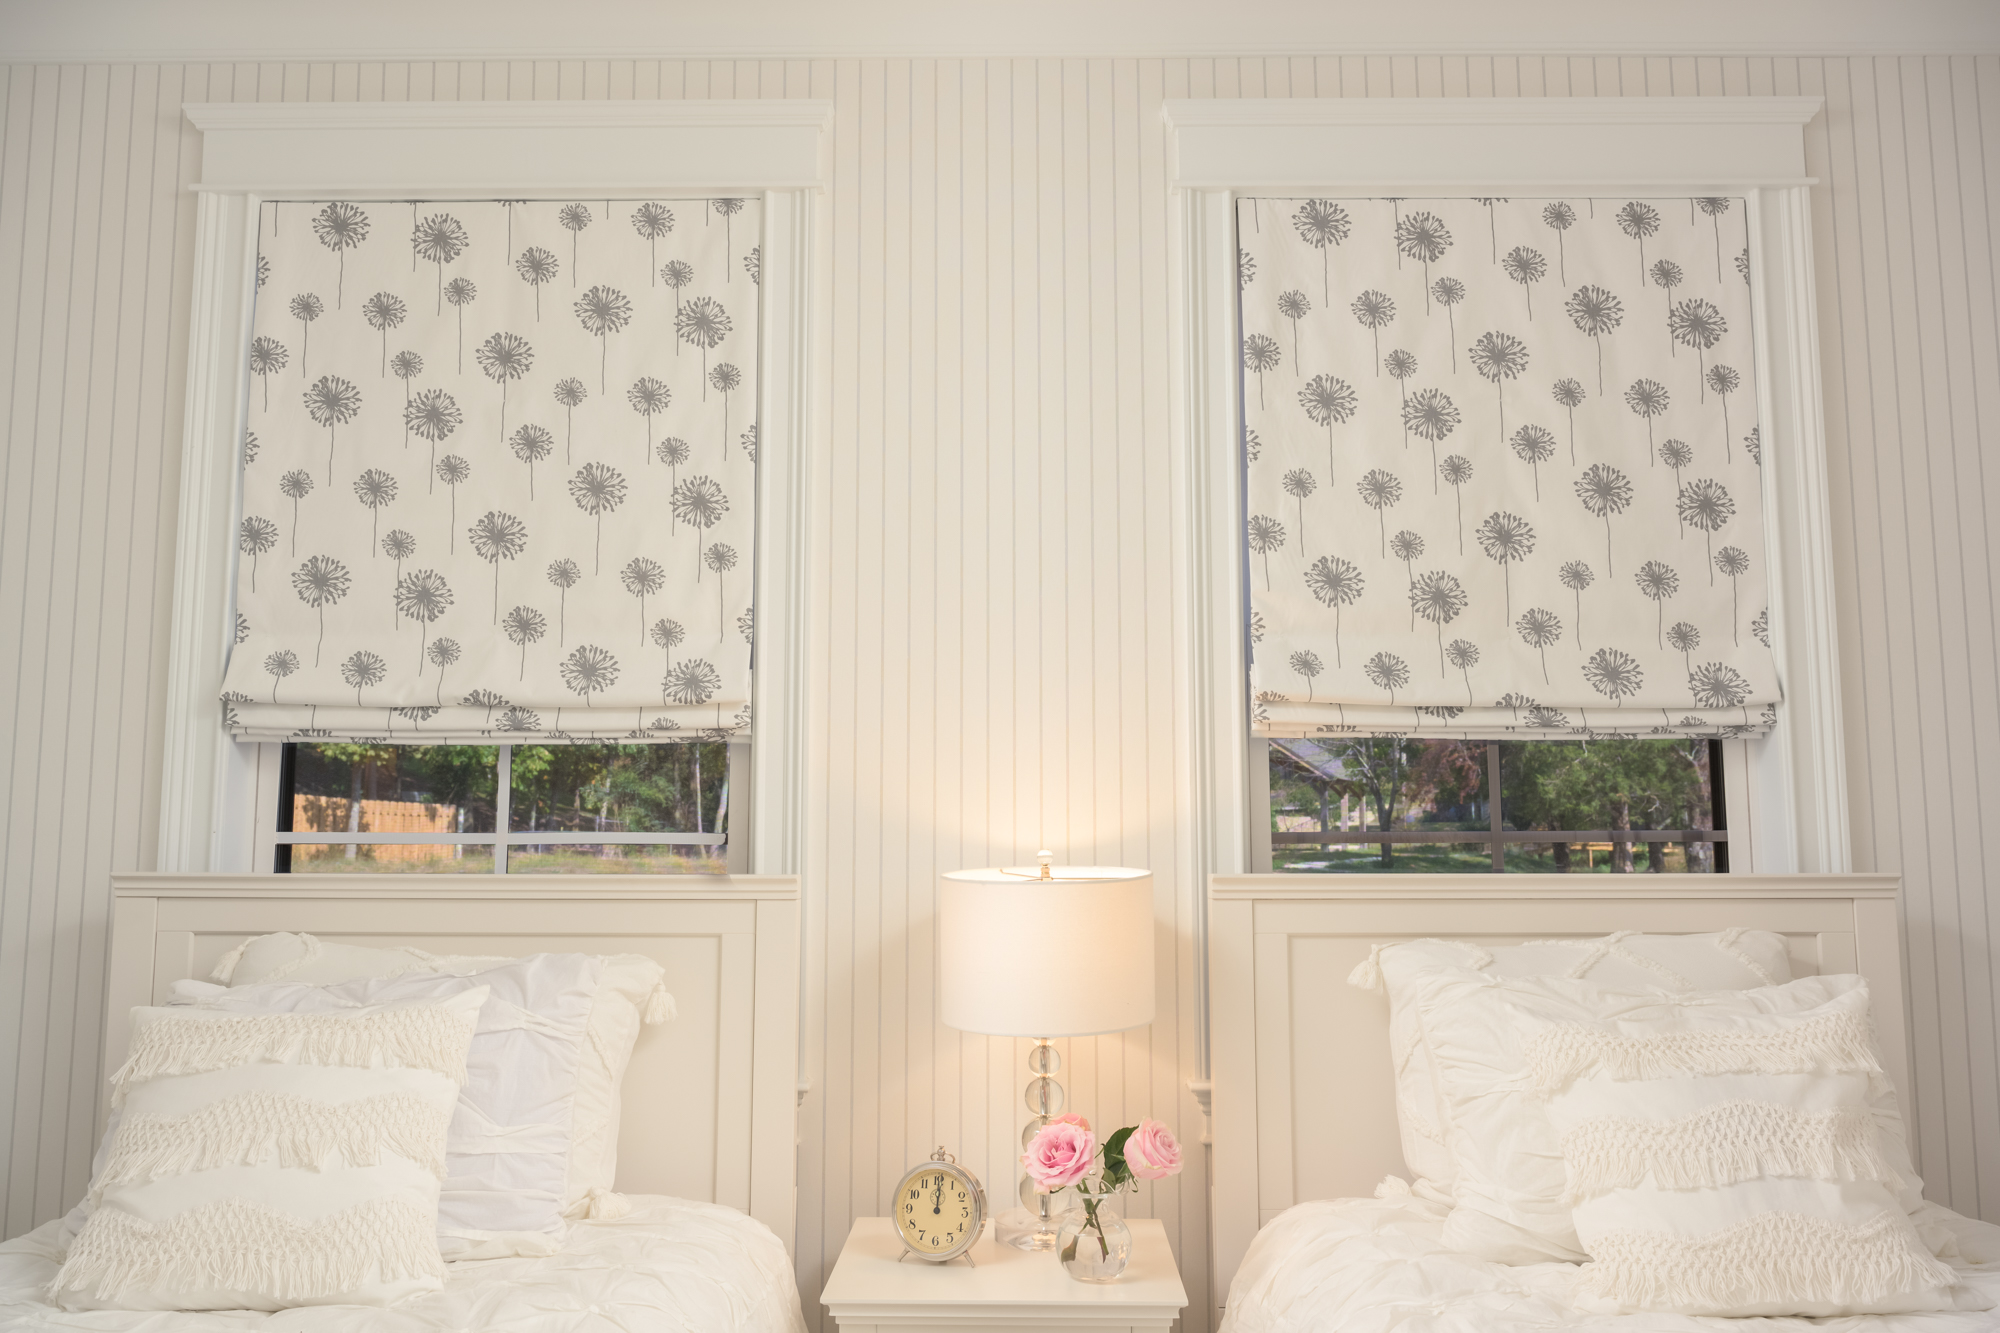 Guest Room Windows 2